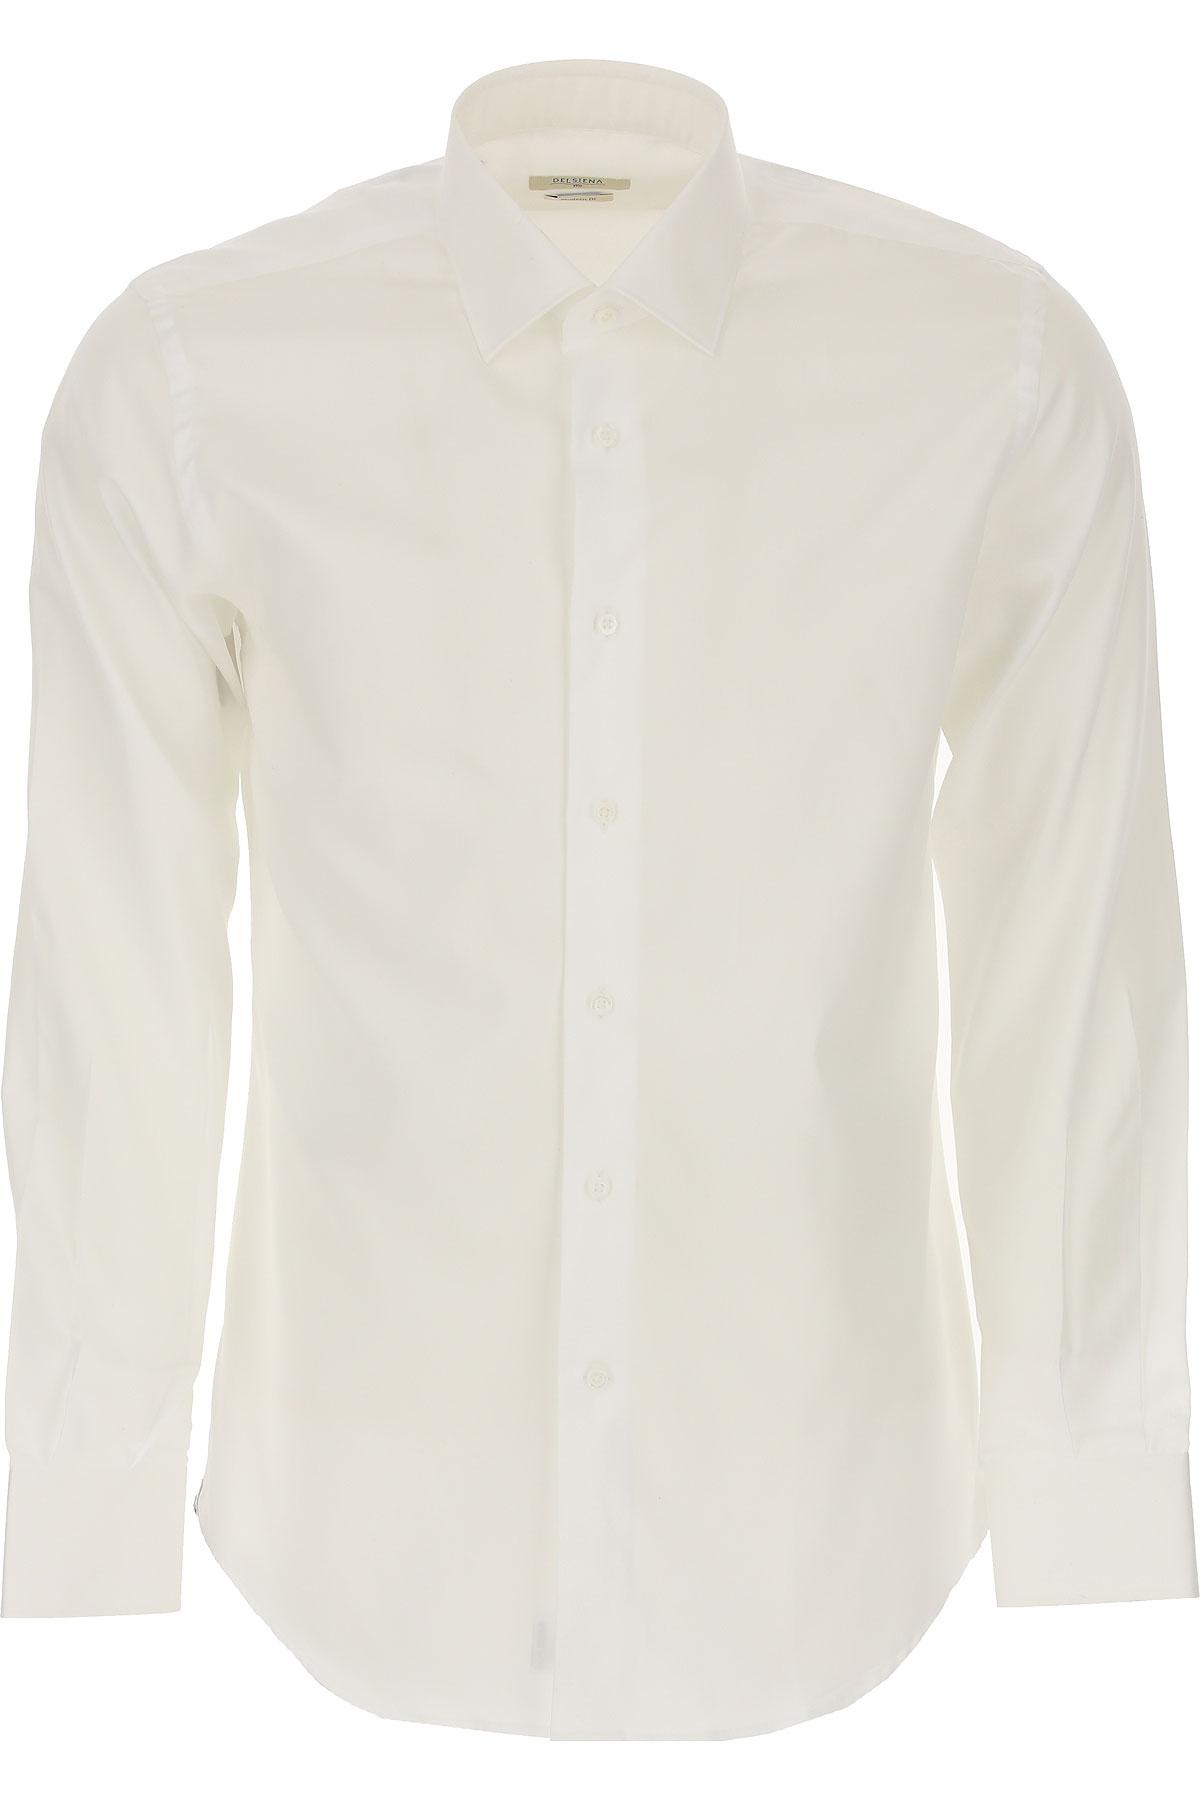 Del Siena Shirt for Men On Sale, White, Cotton, 2019, 15.75 17.5